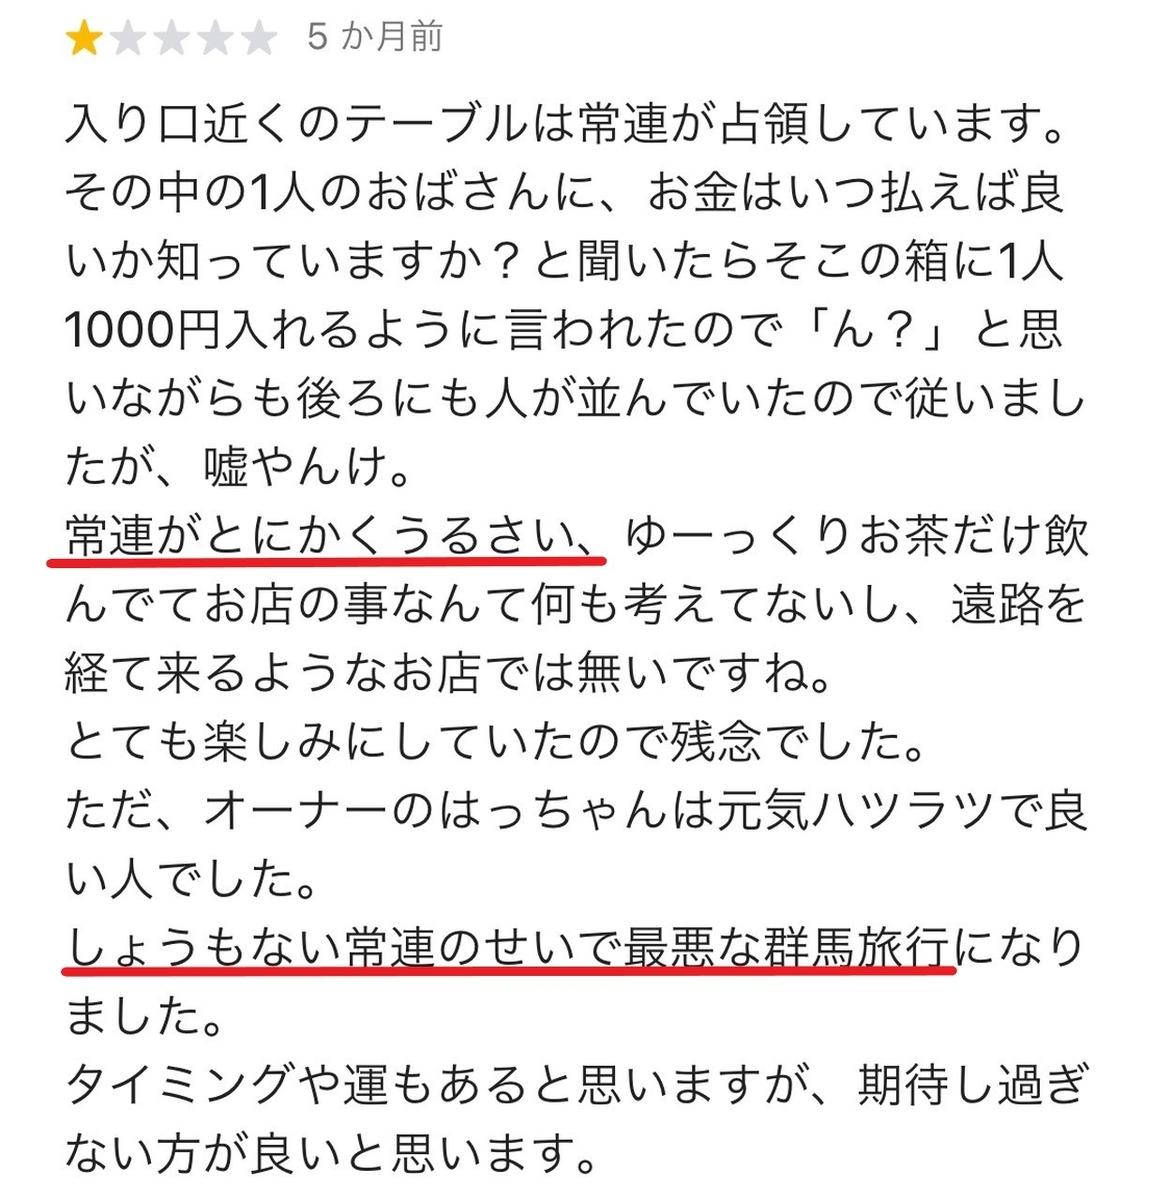 f:id:gk-murai33-gk:20210201101252j:plain